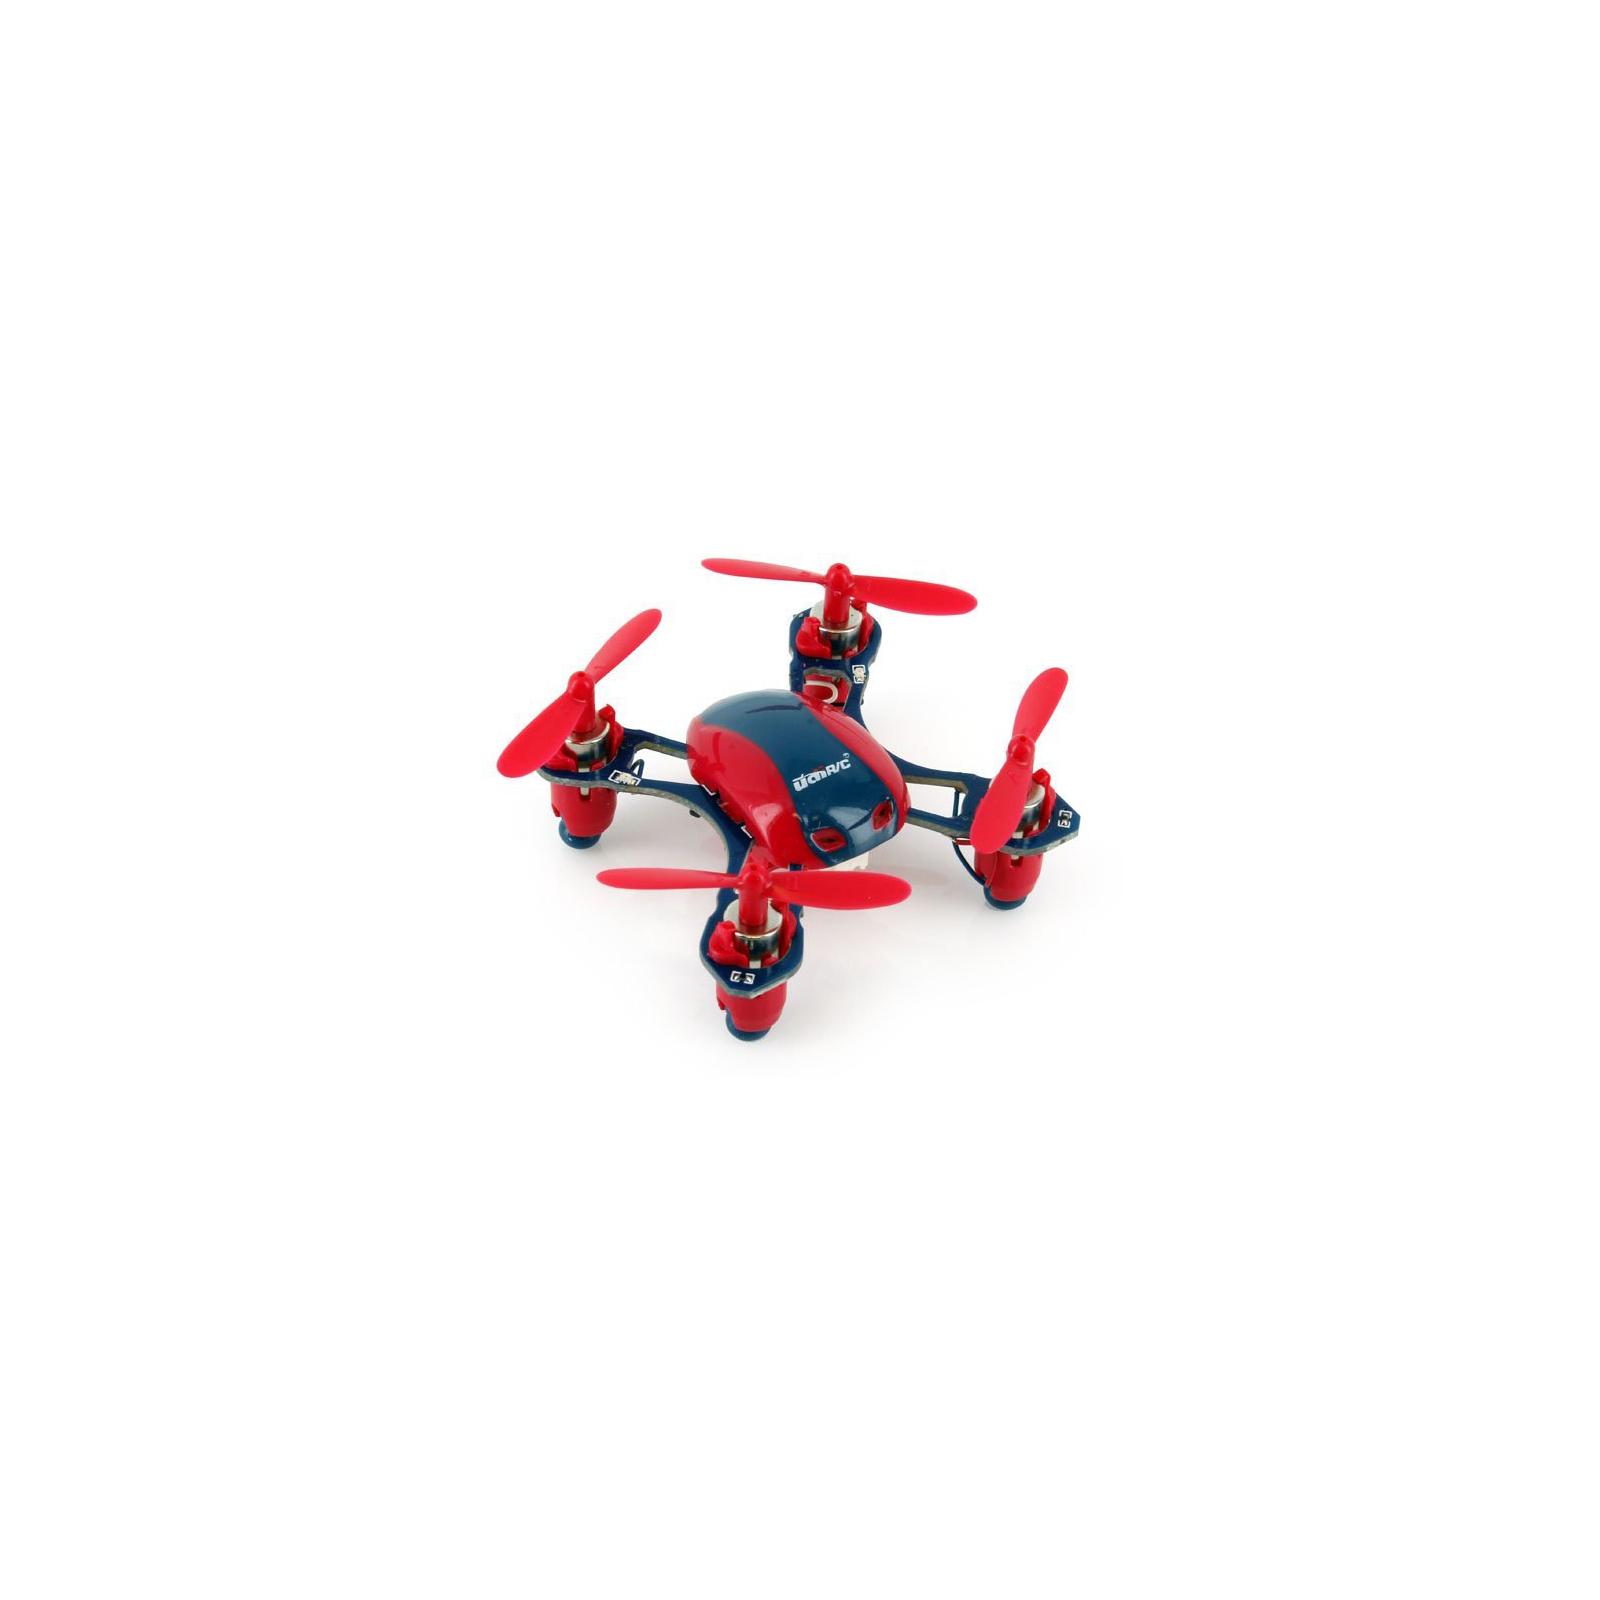 Квадрокоптер UDIRC 2,4 GHz 40 мм мини 3.7V (U840 Red) изображение 2